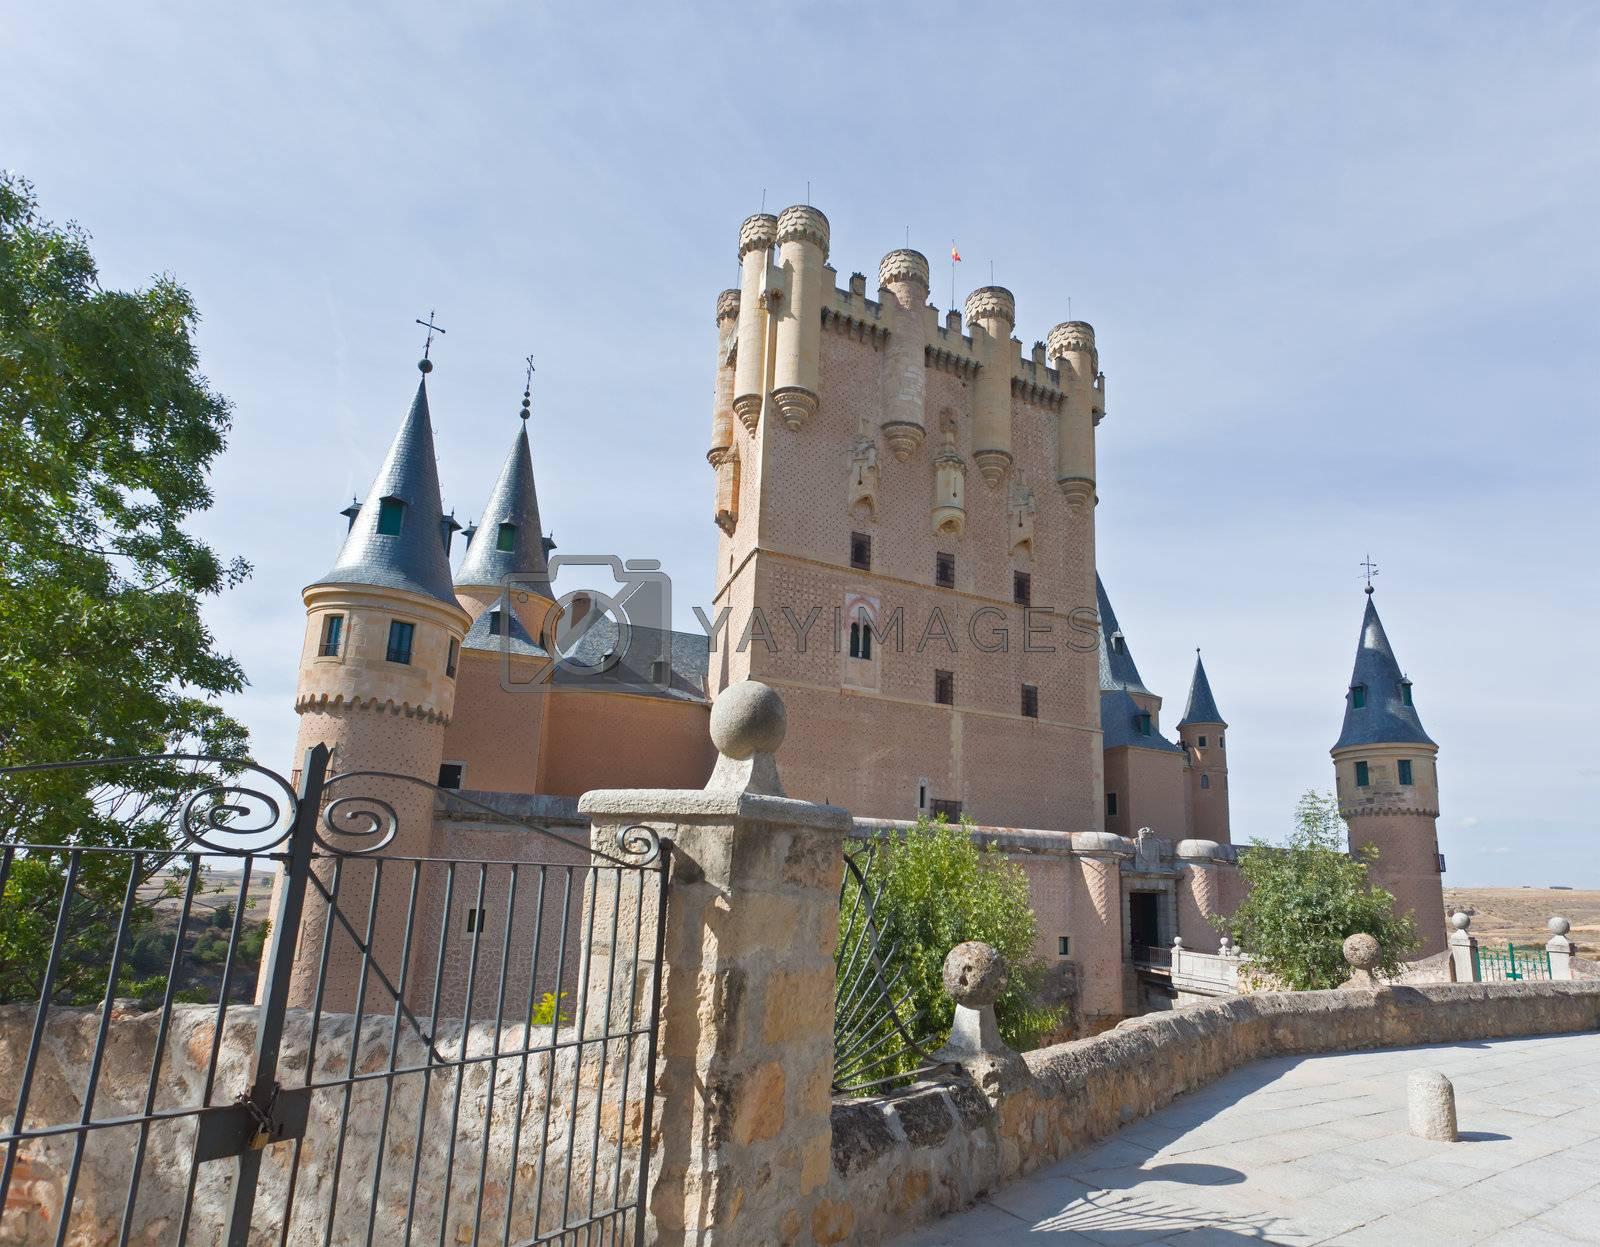 Alcazar fortress of the Segovia city, Spain